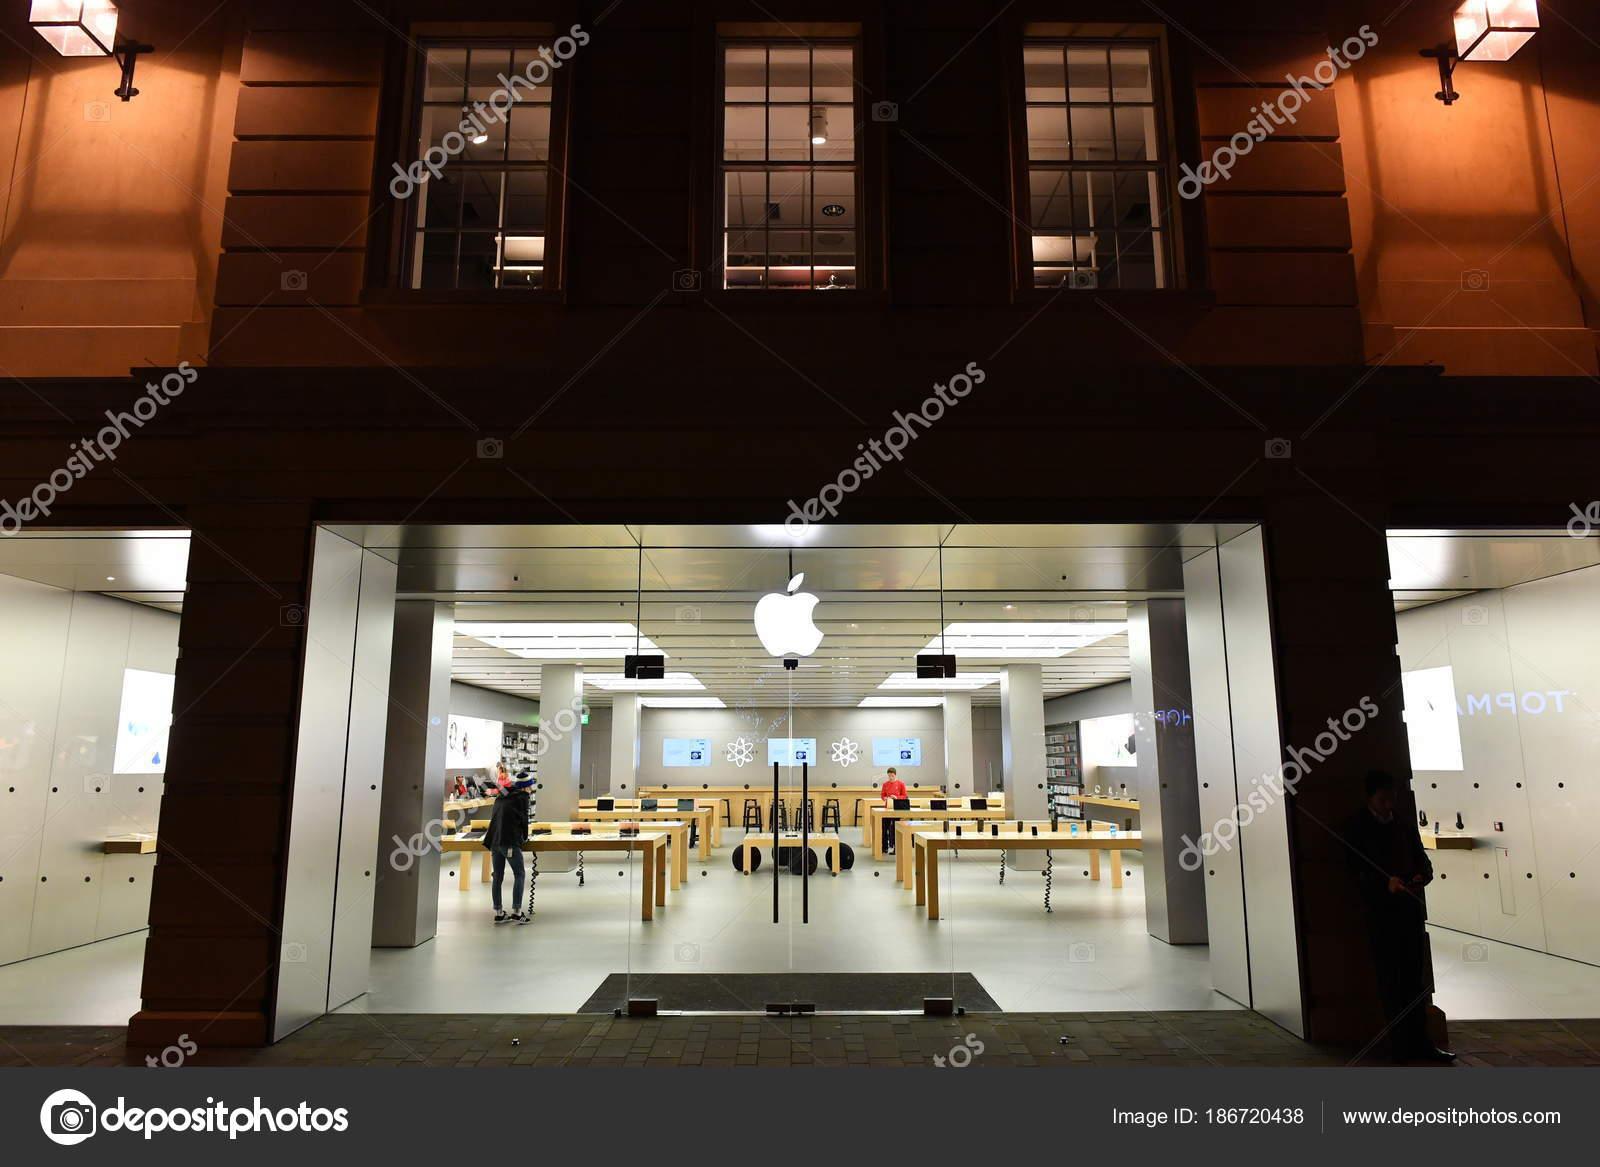 Bath December 2016 Exterior View Apple Store City Center Street